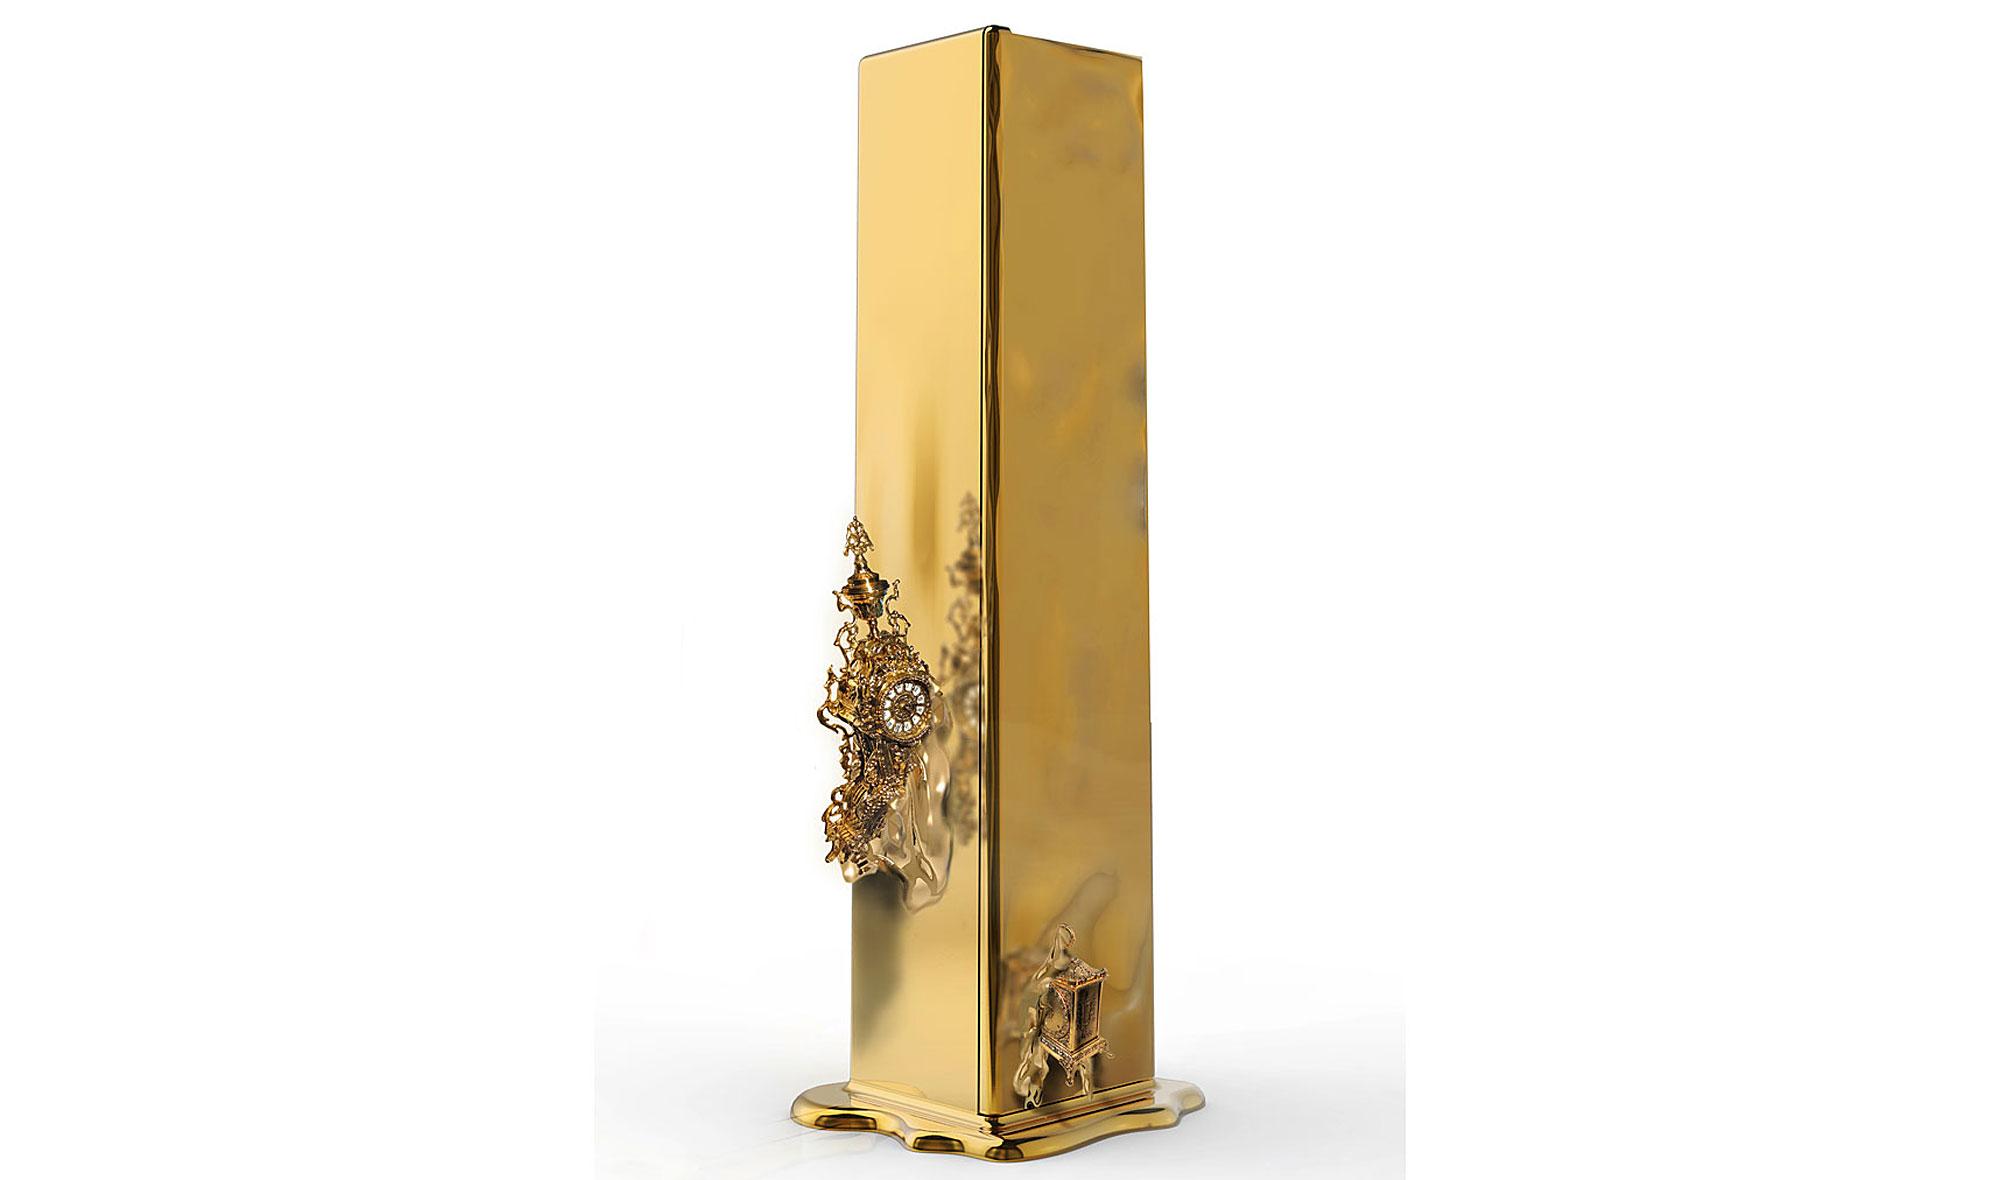 Caja fuerte Luxury Caja fuerte Dalí